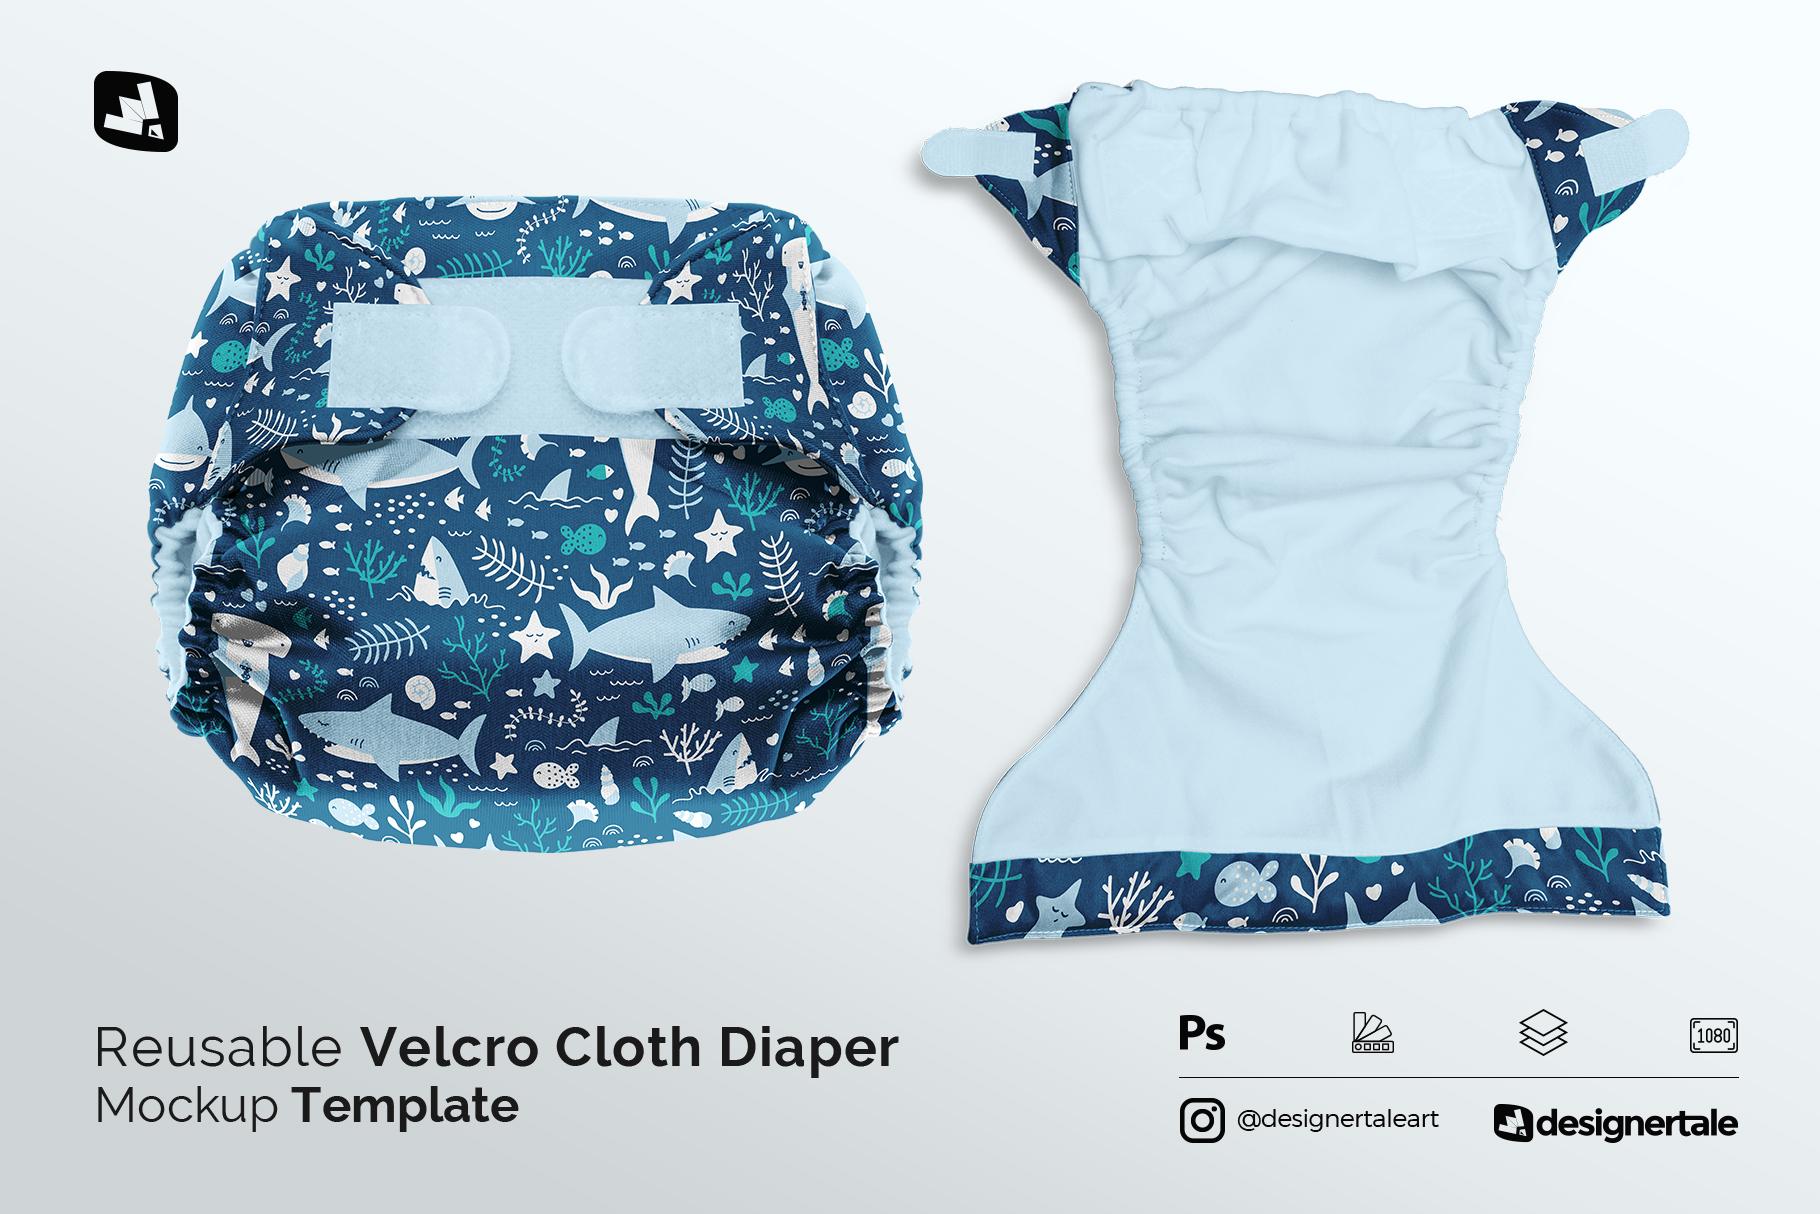 reusable velcro cloth diaper mockup